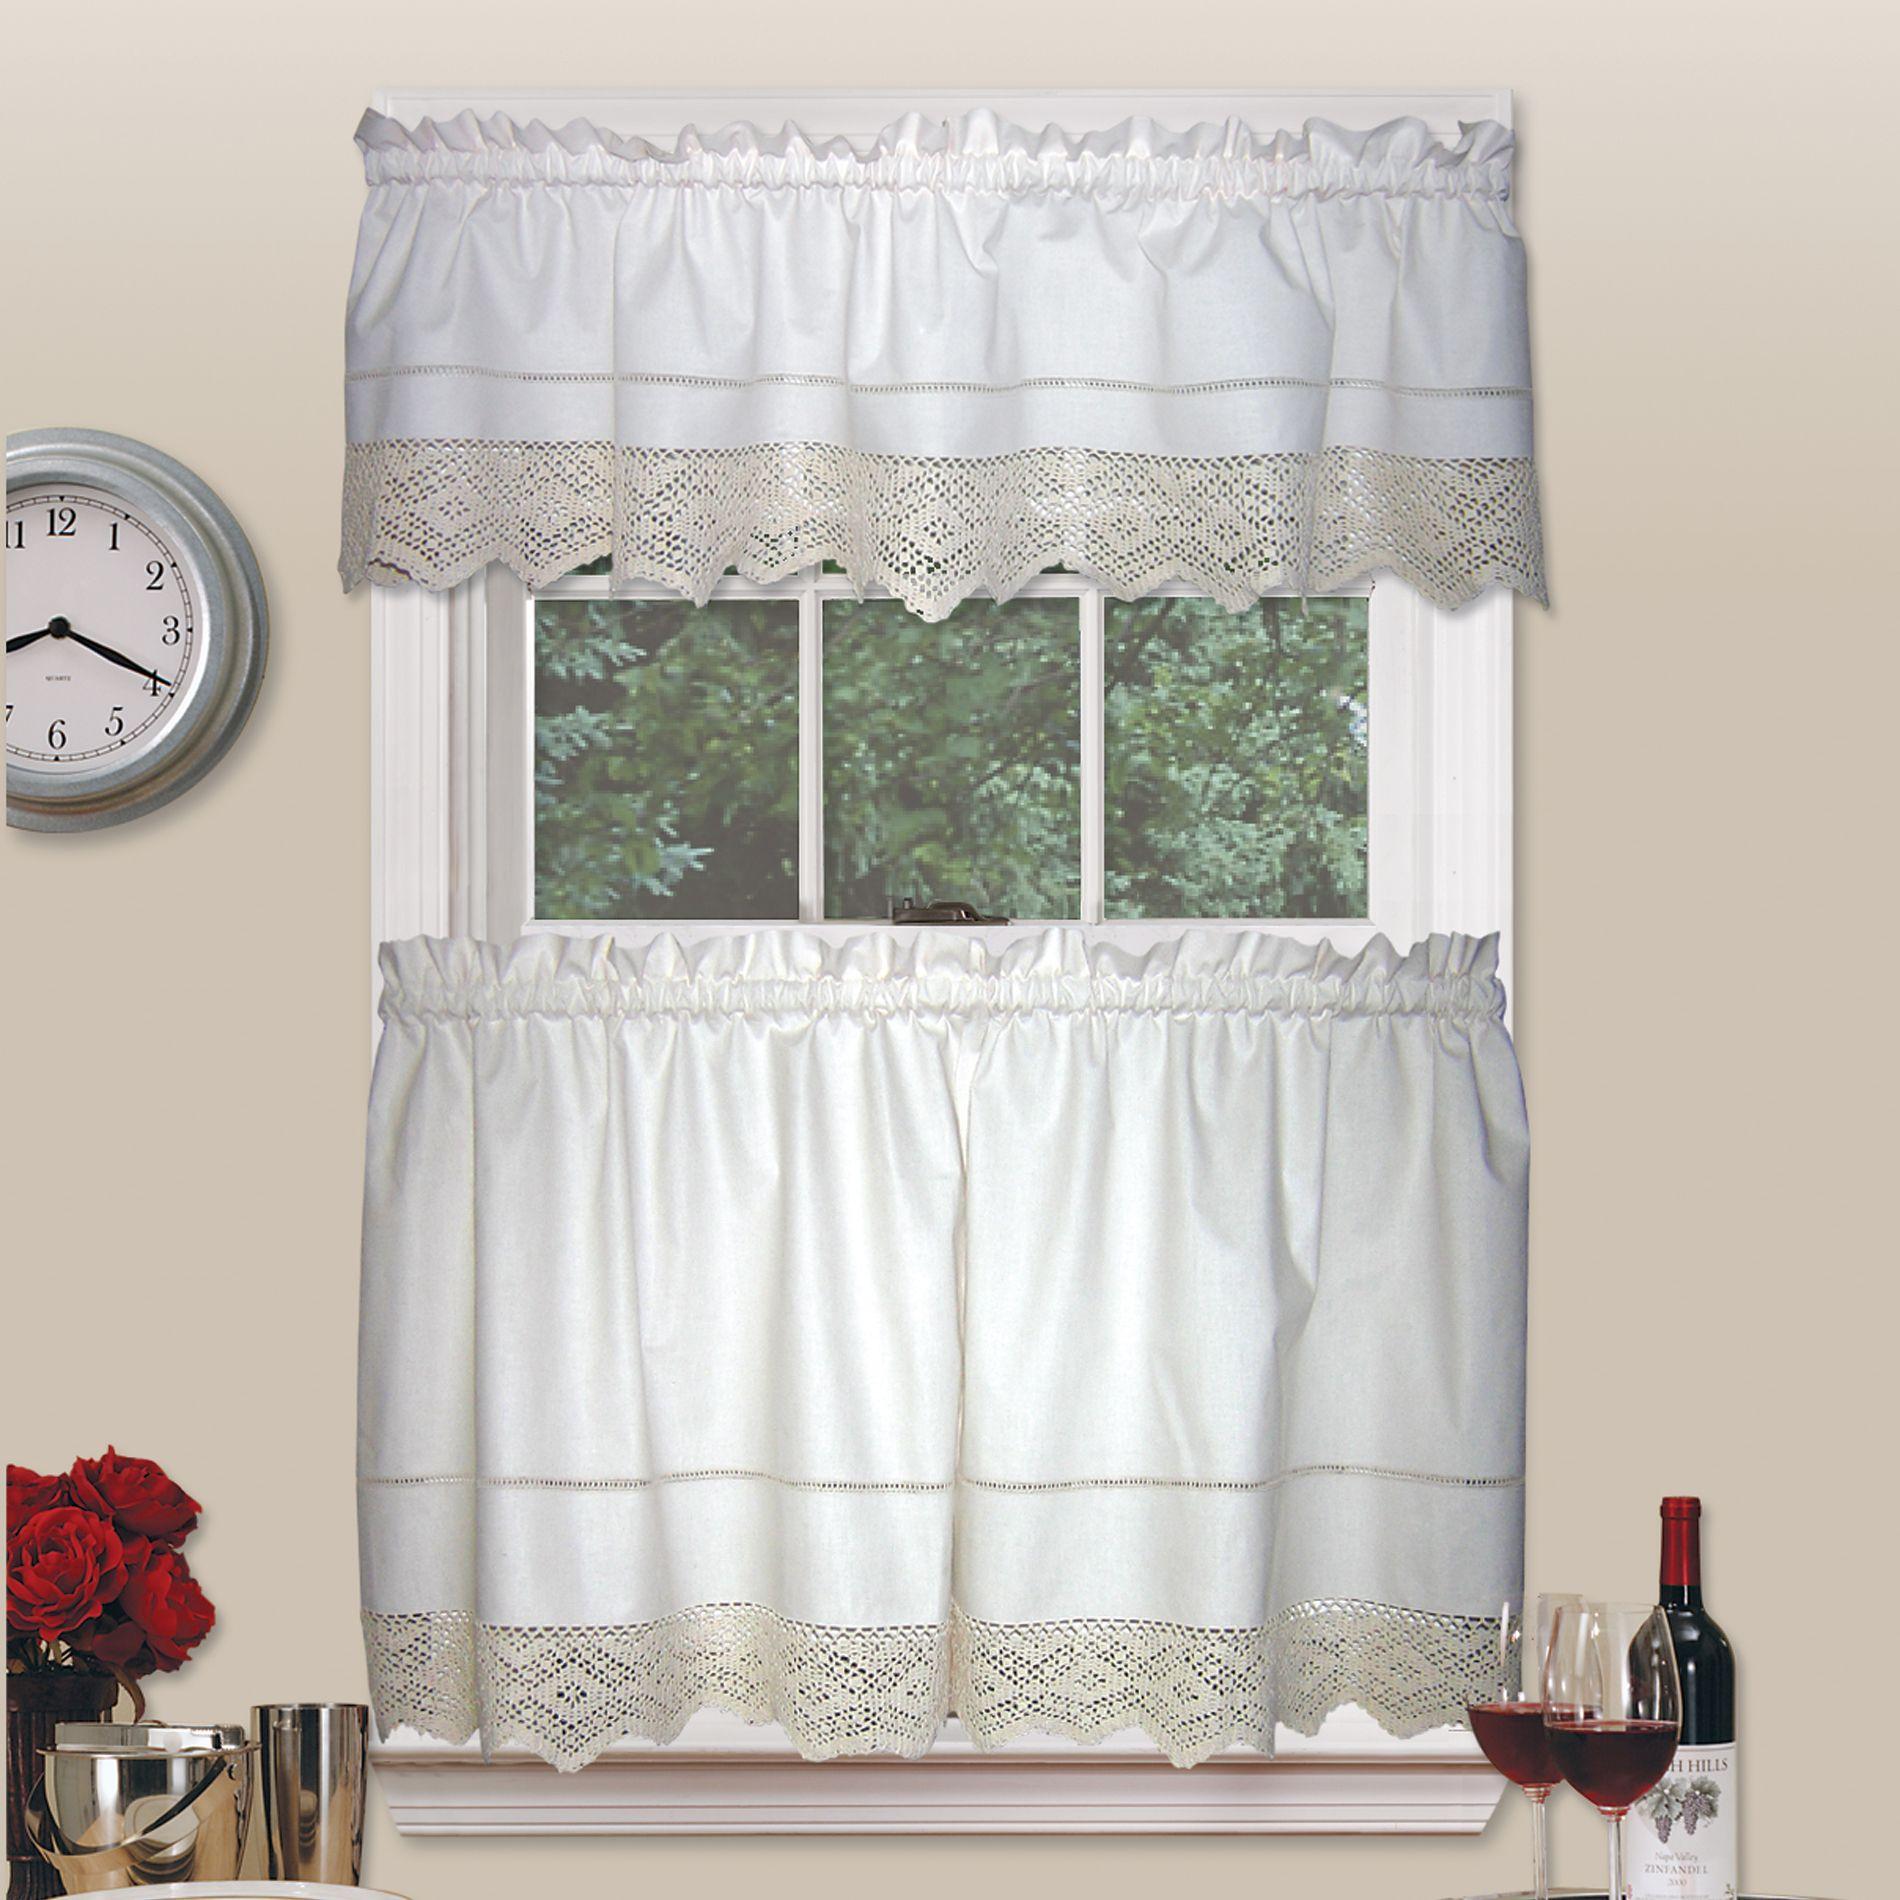 Kitchen Curtains At Kmart .